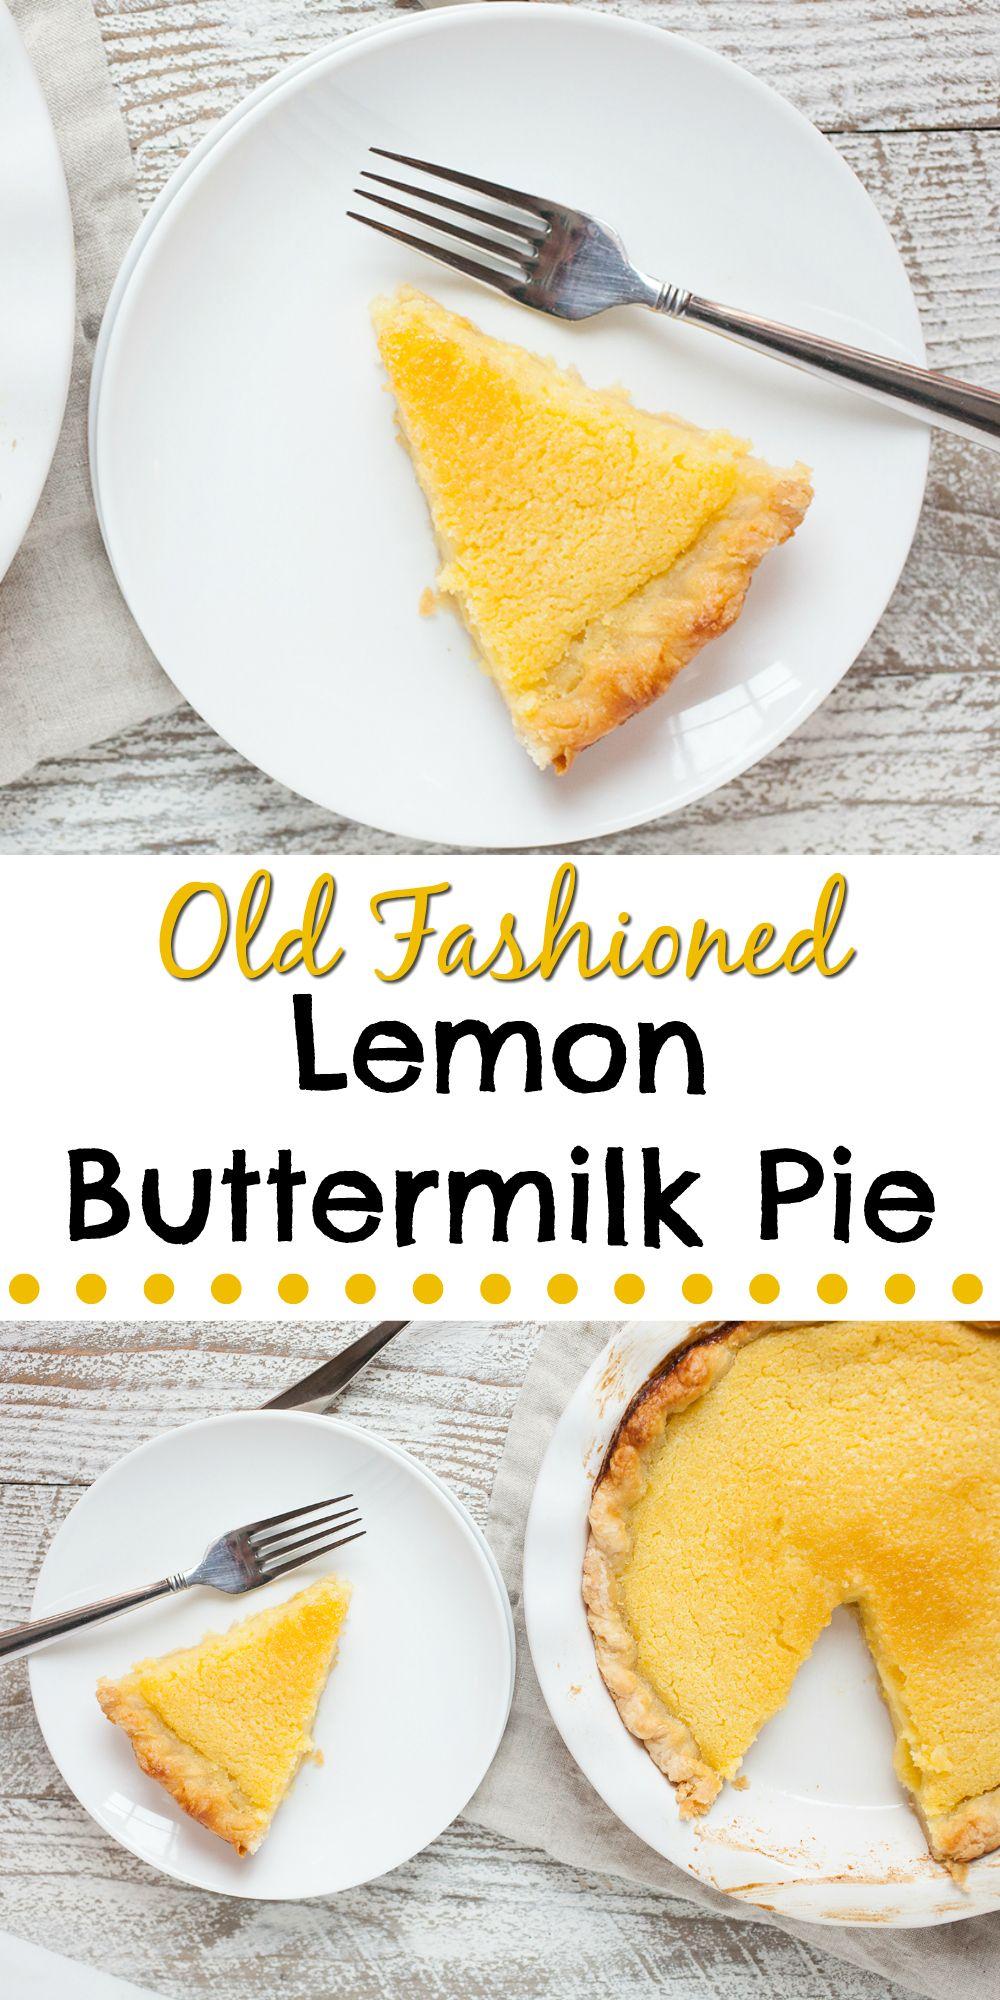 Old Fashioned Lemon Buttermilk Pie Recipe Dessert Recipes Easy Mr Food Recipes Homemade Recipes Dessert